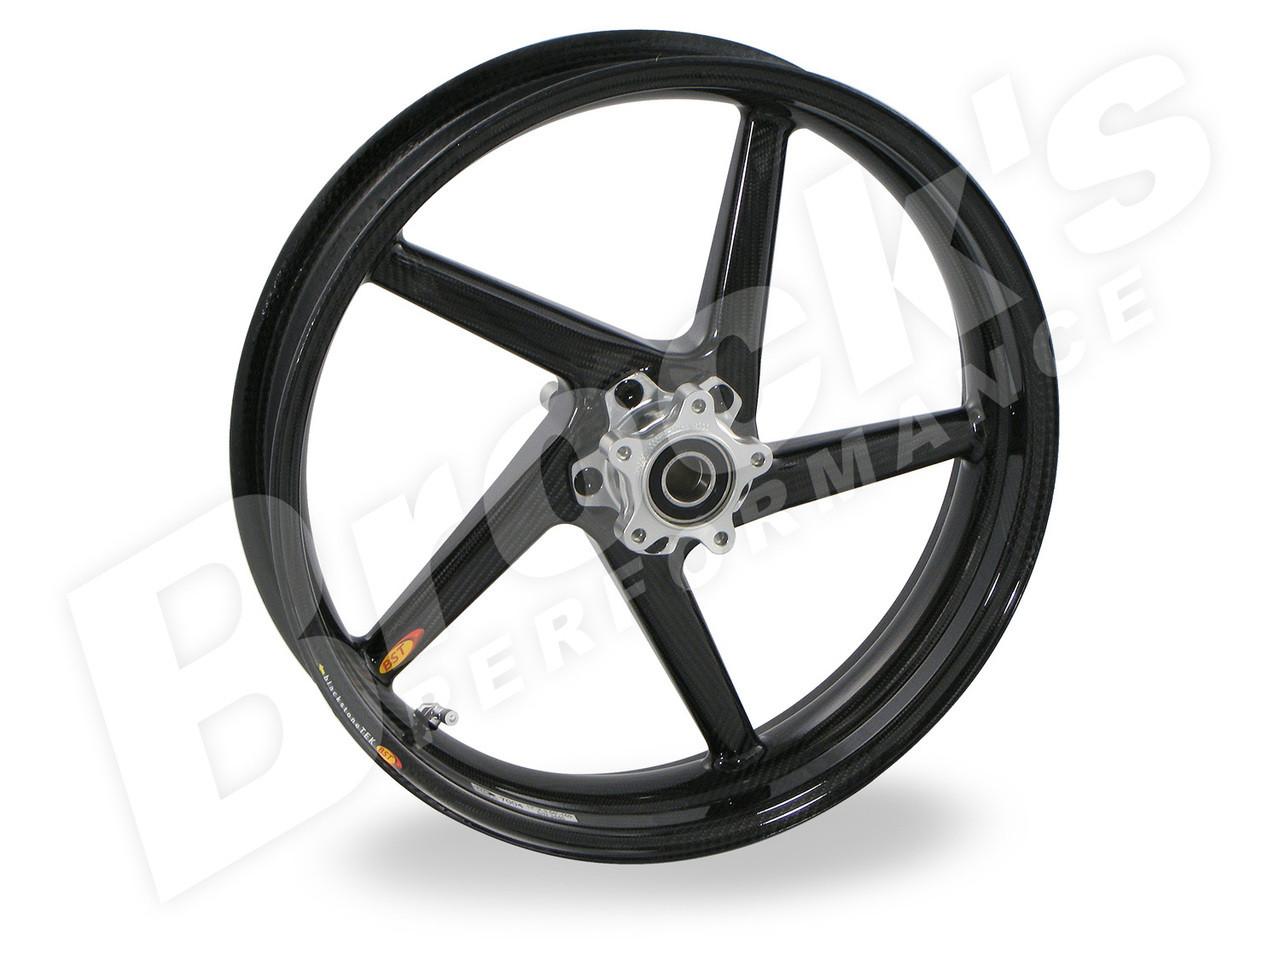 hight resolution of ducati front wheel wiring diagram online wiring diagram kawasaki atv wiring diagram ducati front wheel wiring diagram